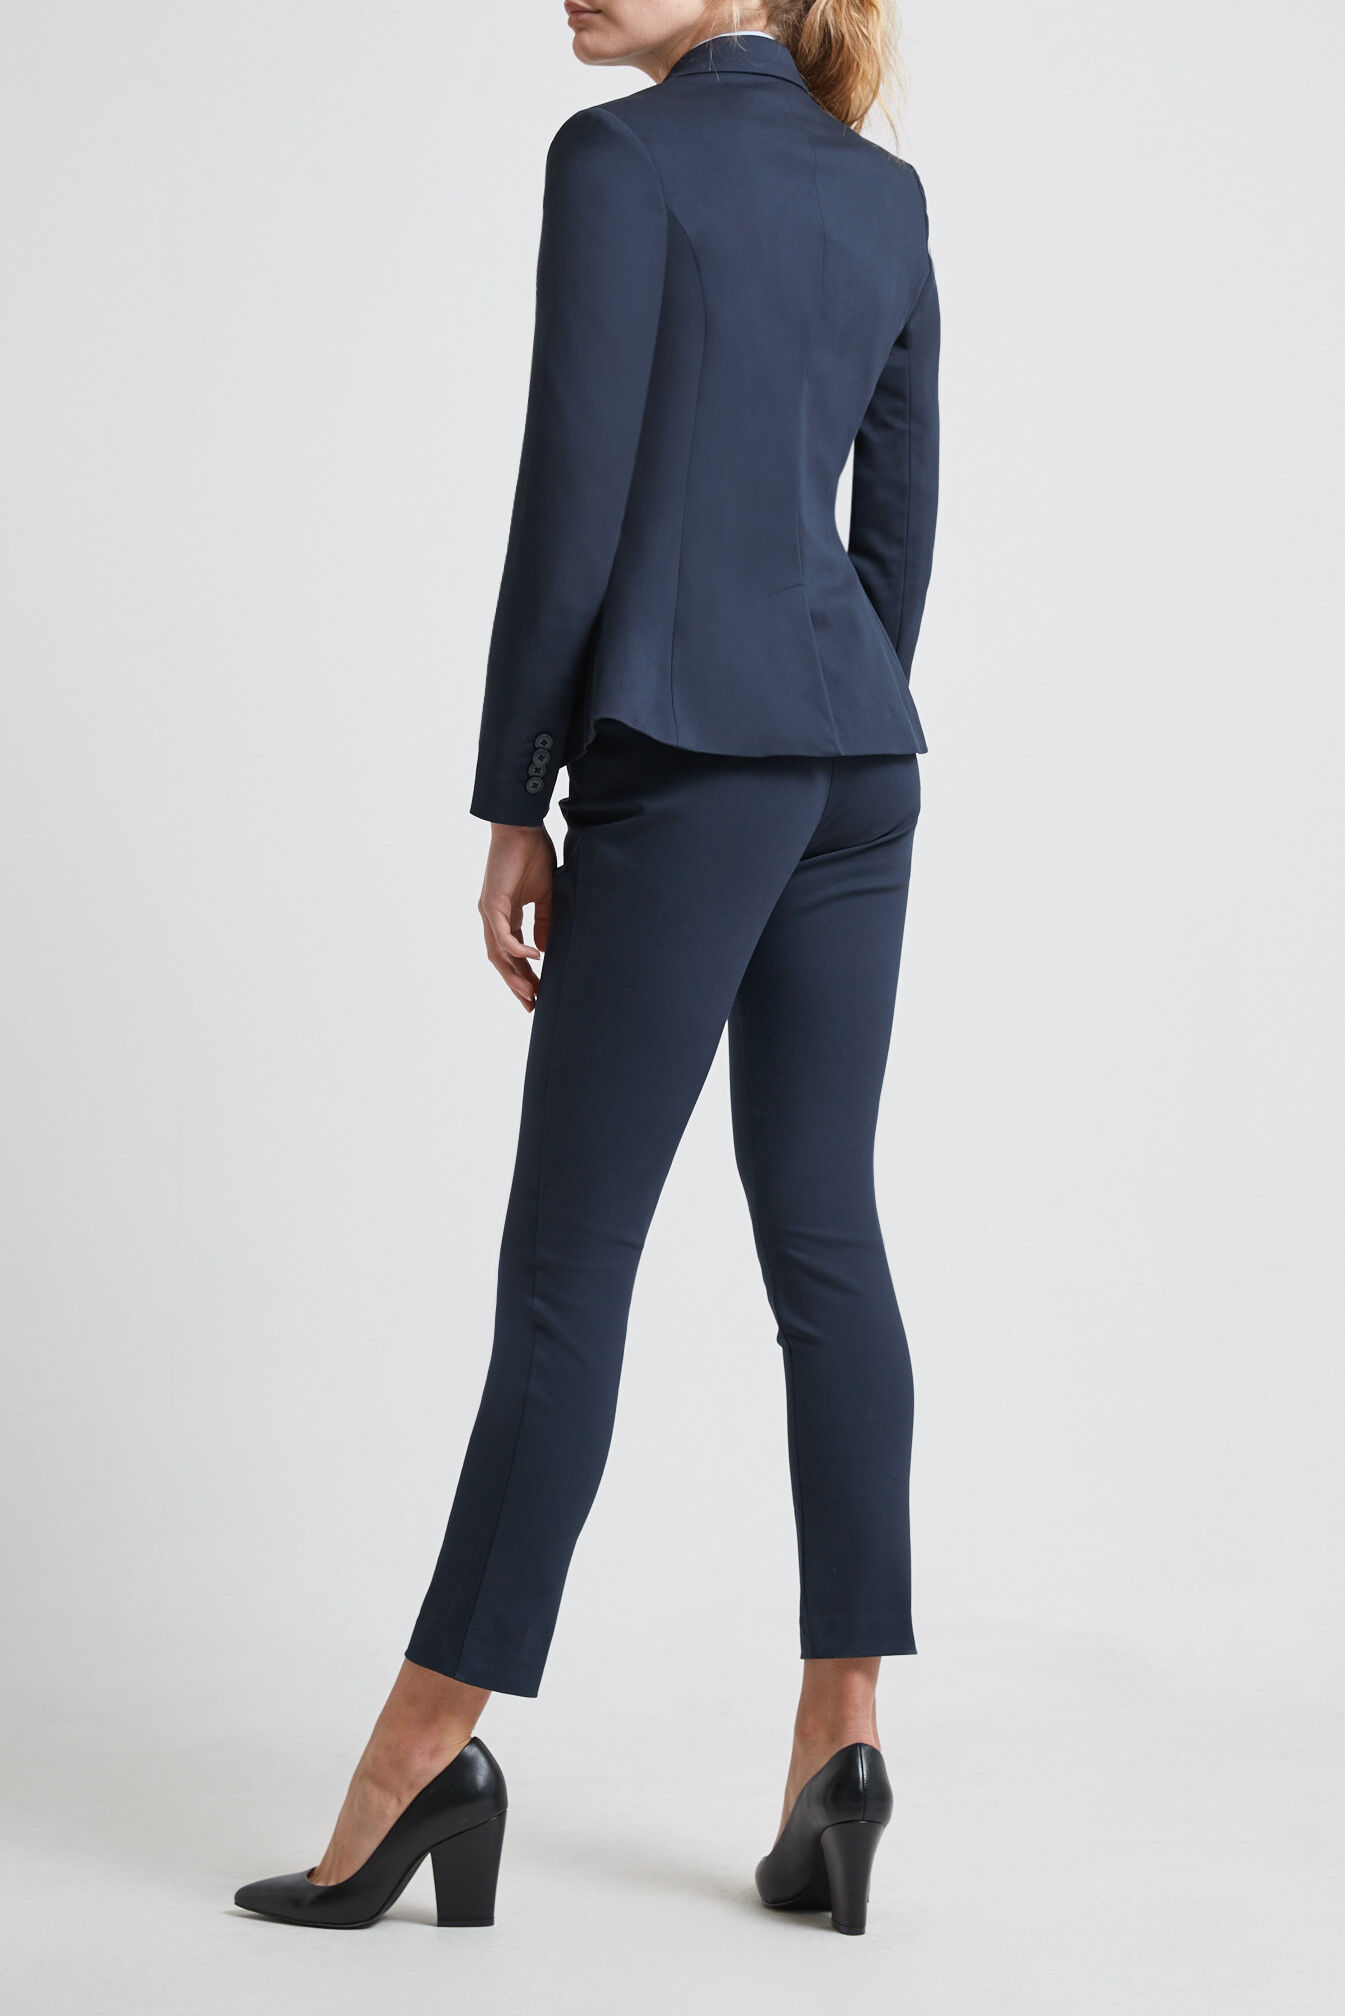 new saba womens suit jacket coats jackets ebay